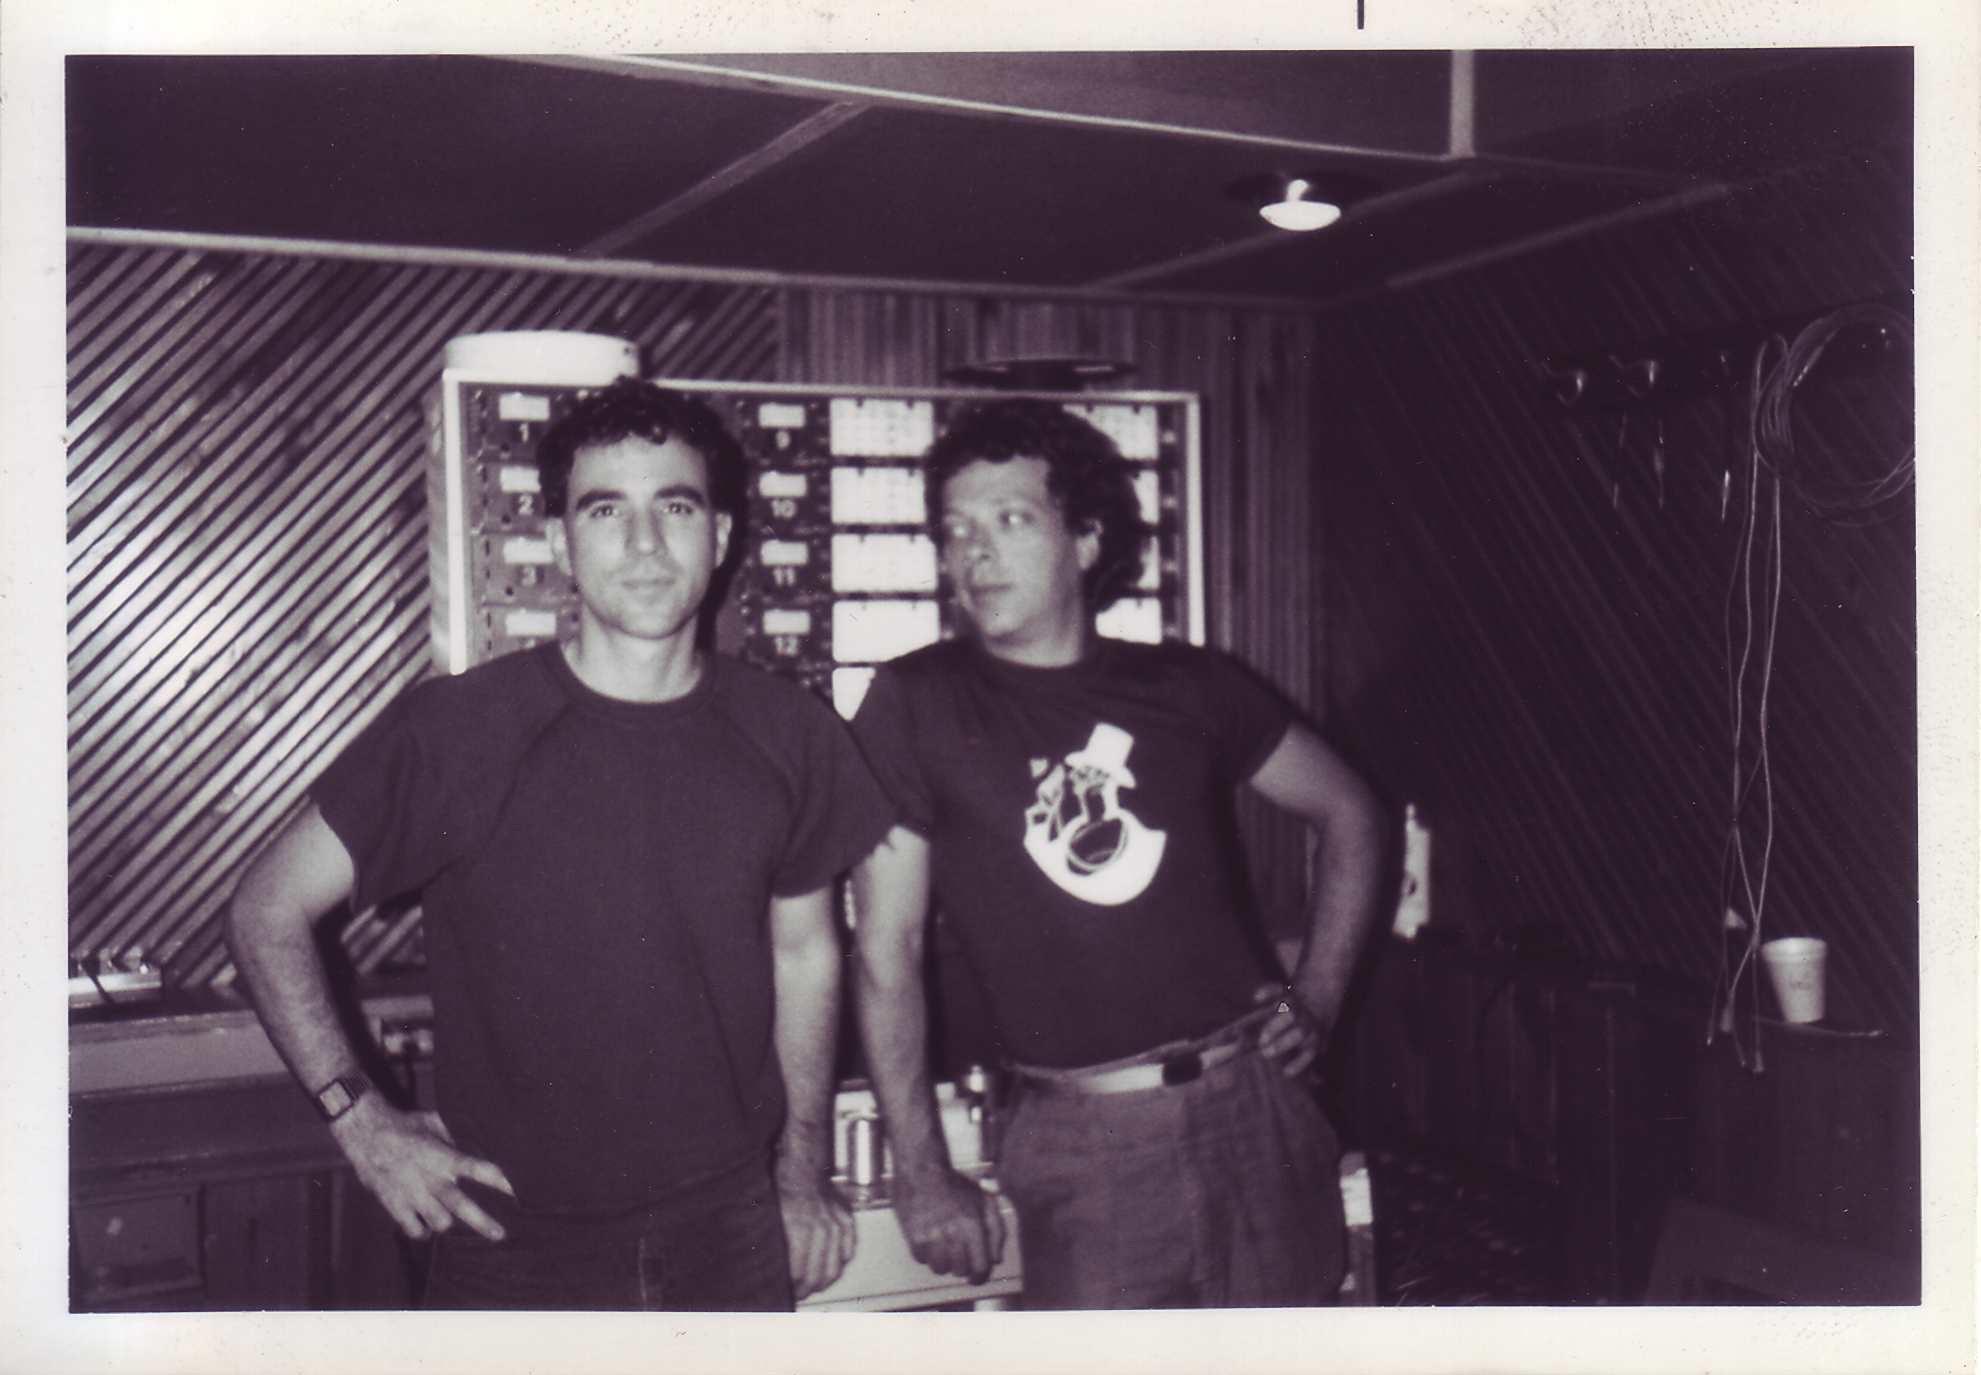 Double Dee and Steinski - Intergalactic Studios #1